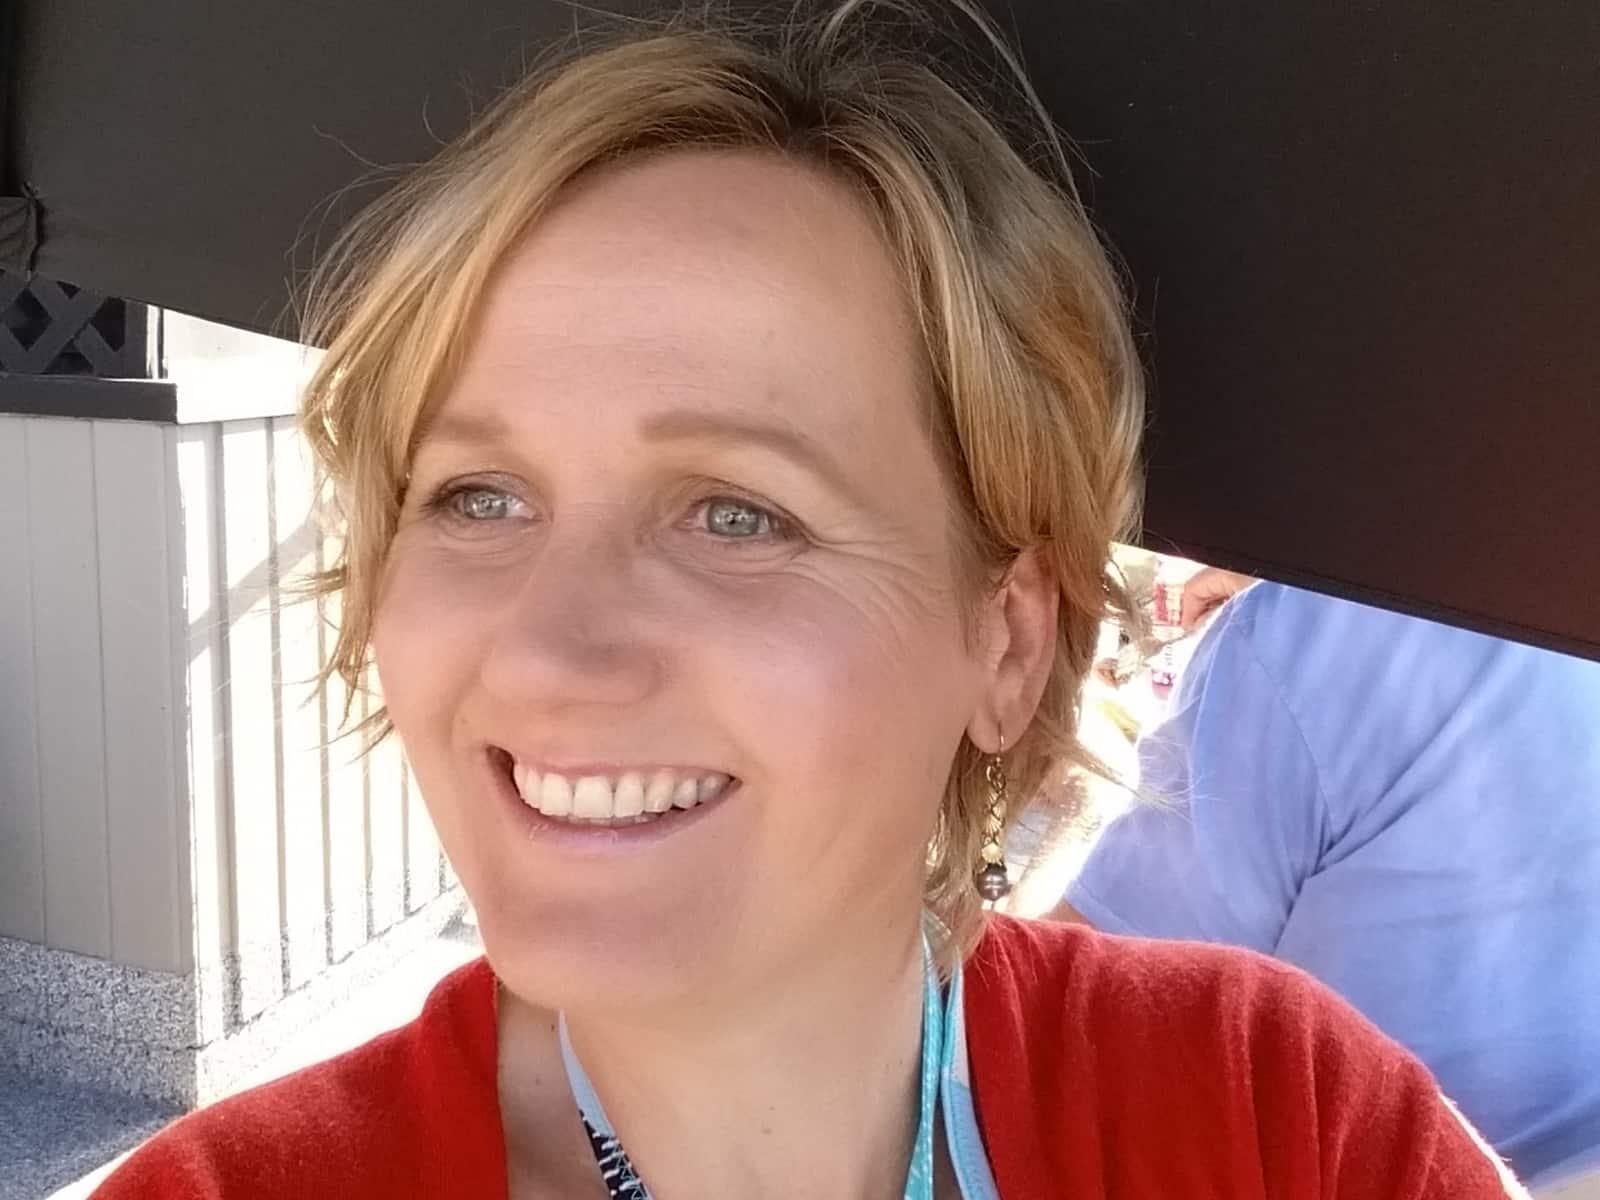 Louise from Kelowna, British Columbia, Canada